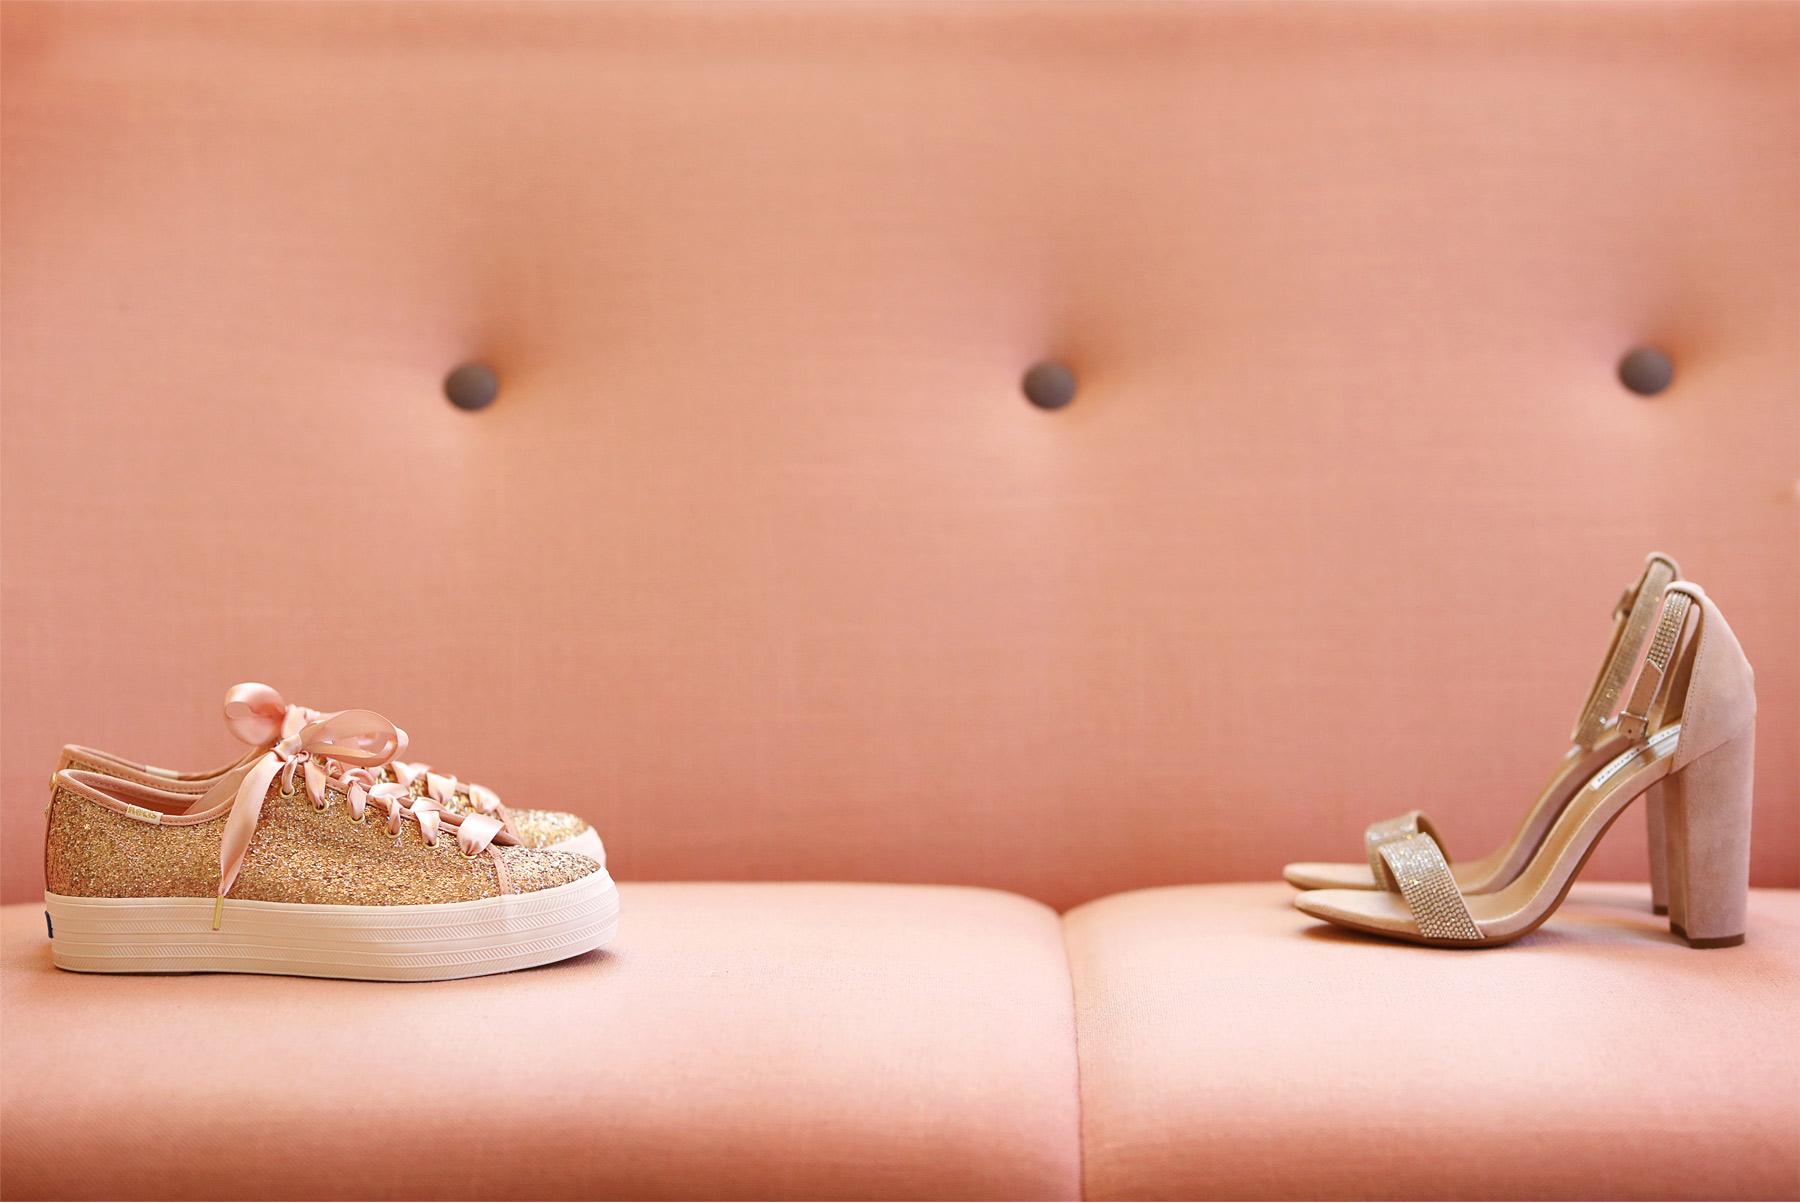 01-Minneapolis-Minnesota-Wedding-Andrew-Vick-Photography-Calhoun-Beach-Club-Shoes-High-Heels-Sneakers-Glitter-Pink-Samantha-and-Ryan.jpg